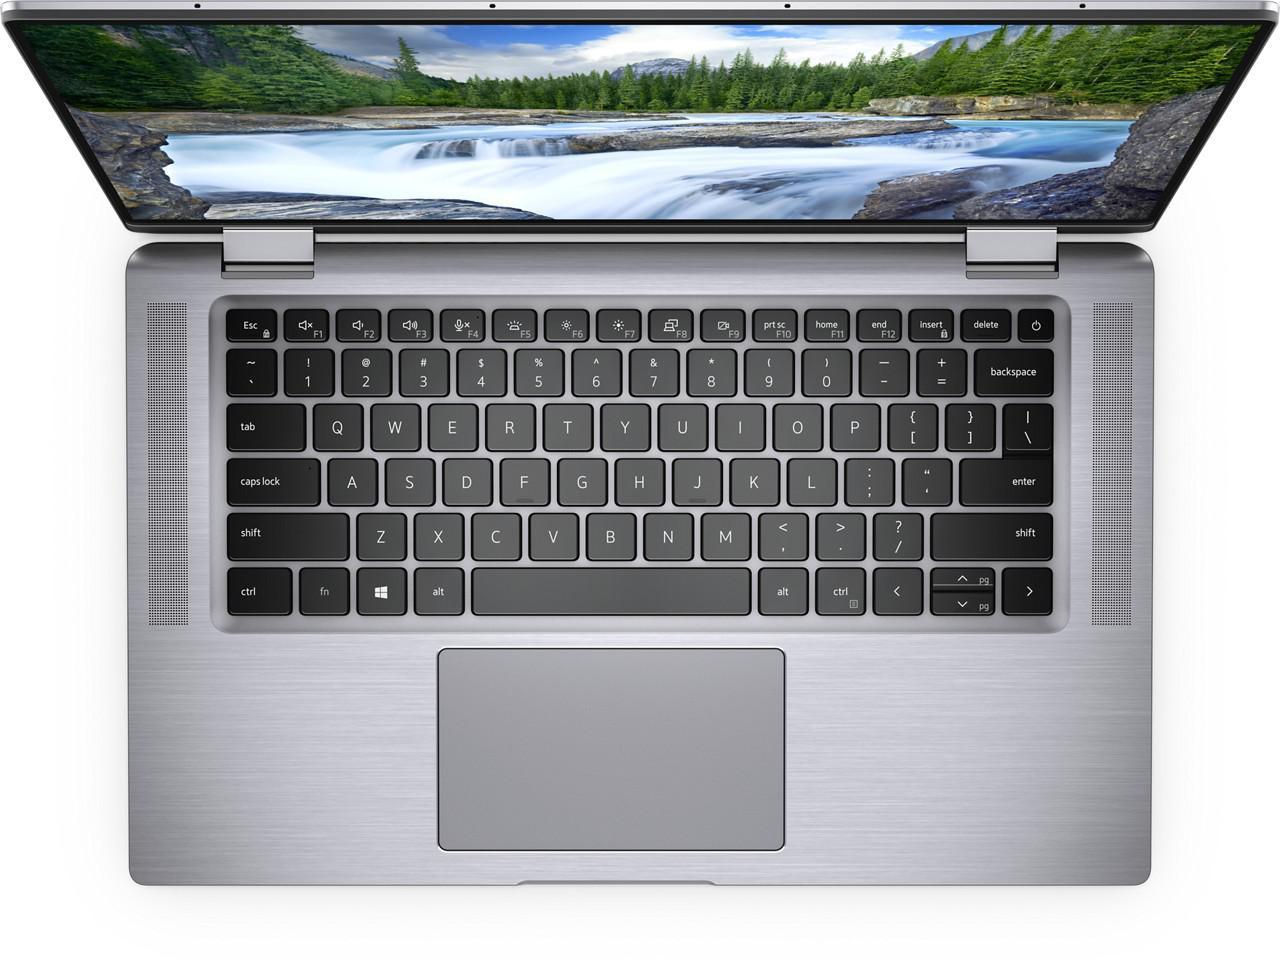 "Laptop Dell Latitude 9520, Clamshell, 15.0"" FHD, i7-1185G7, 16GB, 512GB SSD, Intel Iris Xe Graphics, W10 Pro - imaginea 2"